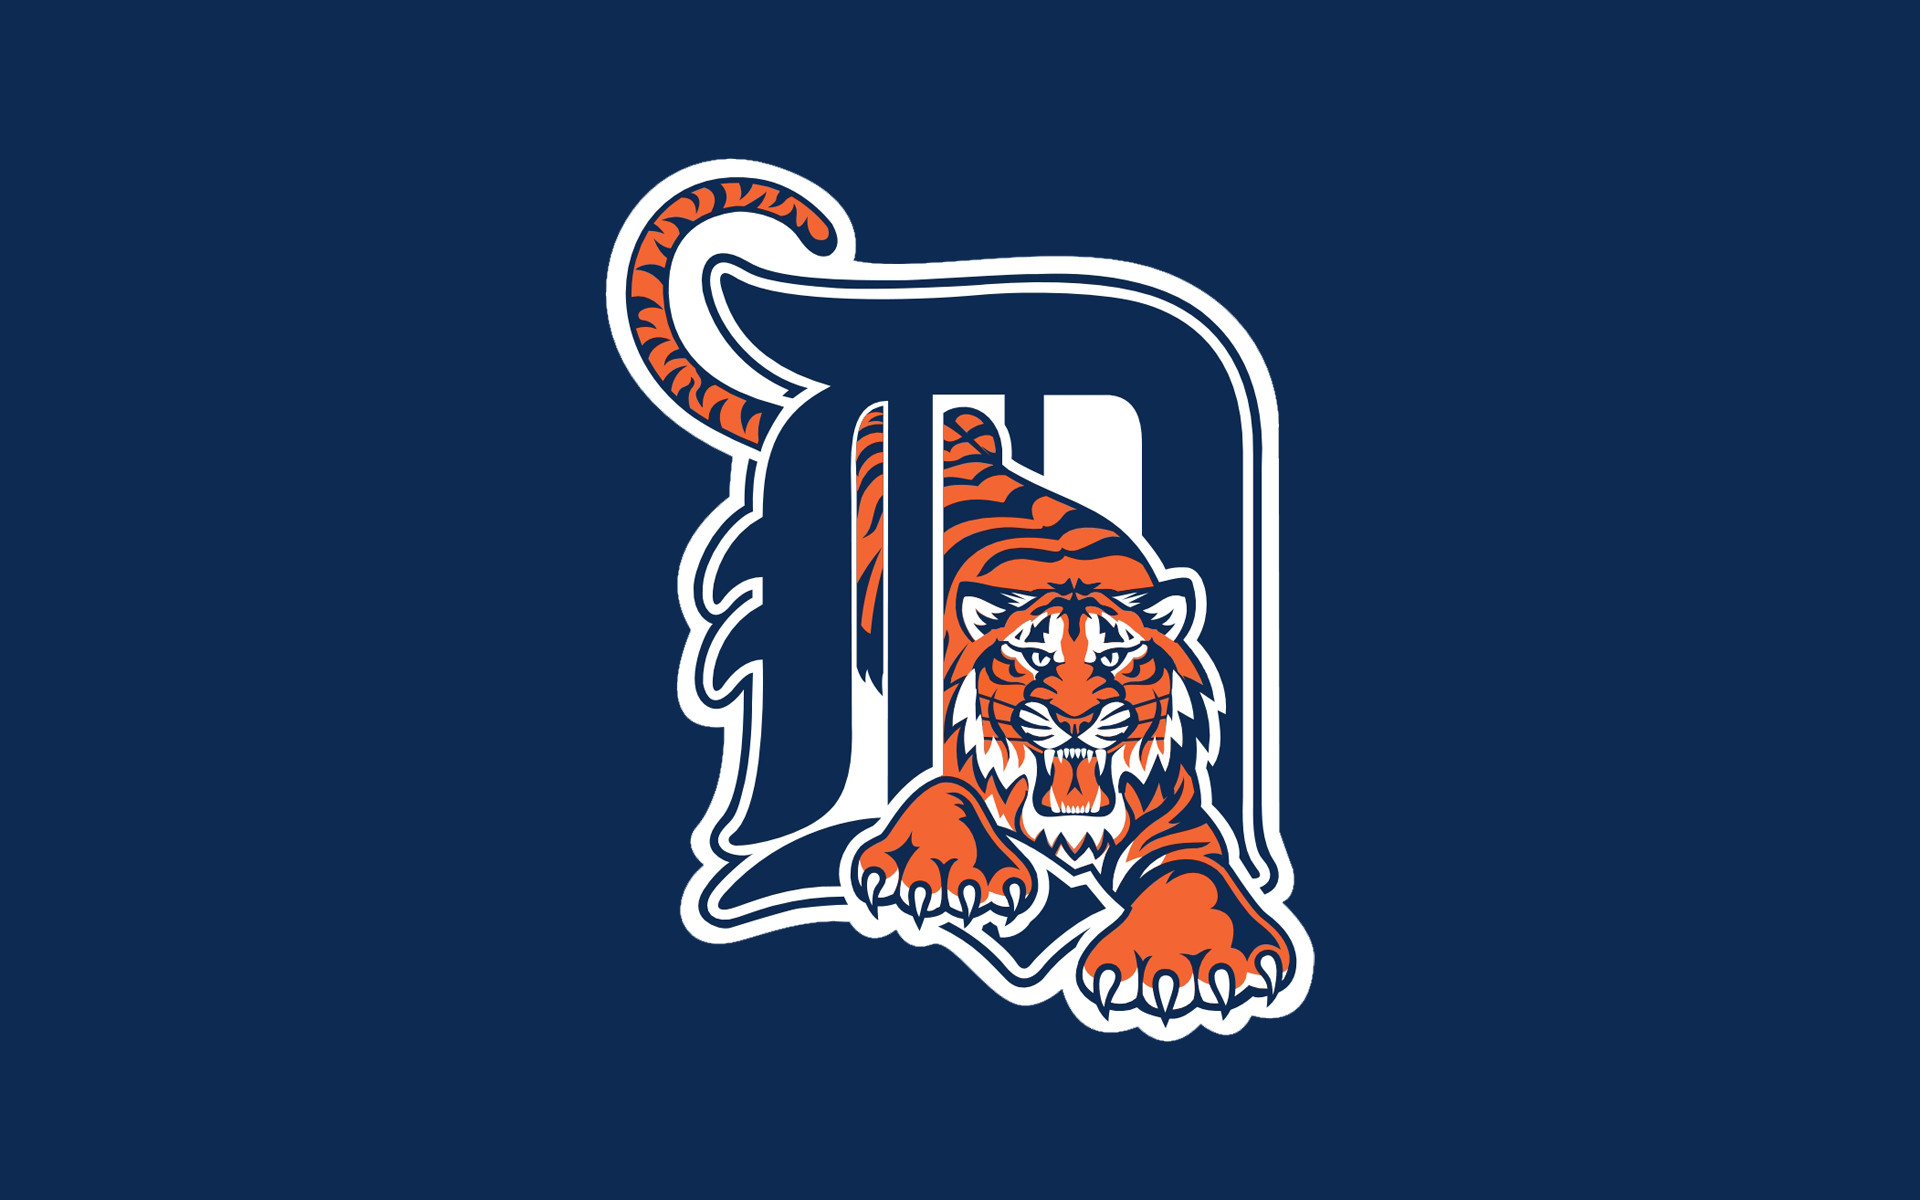 Detroit Tigers Wallpaper (8 Wallpapers)